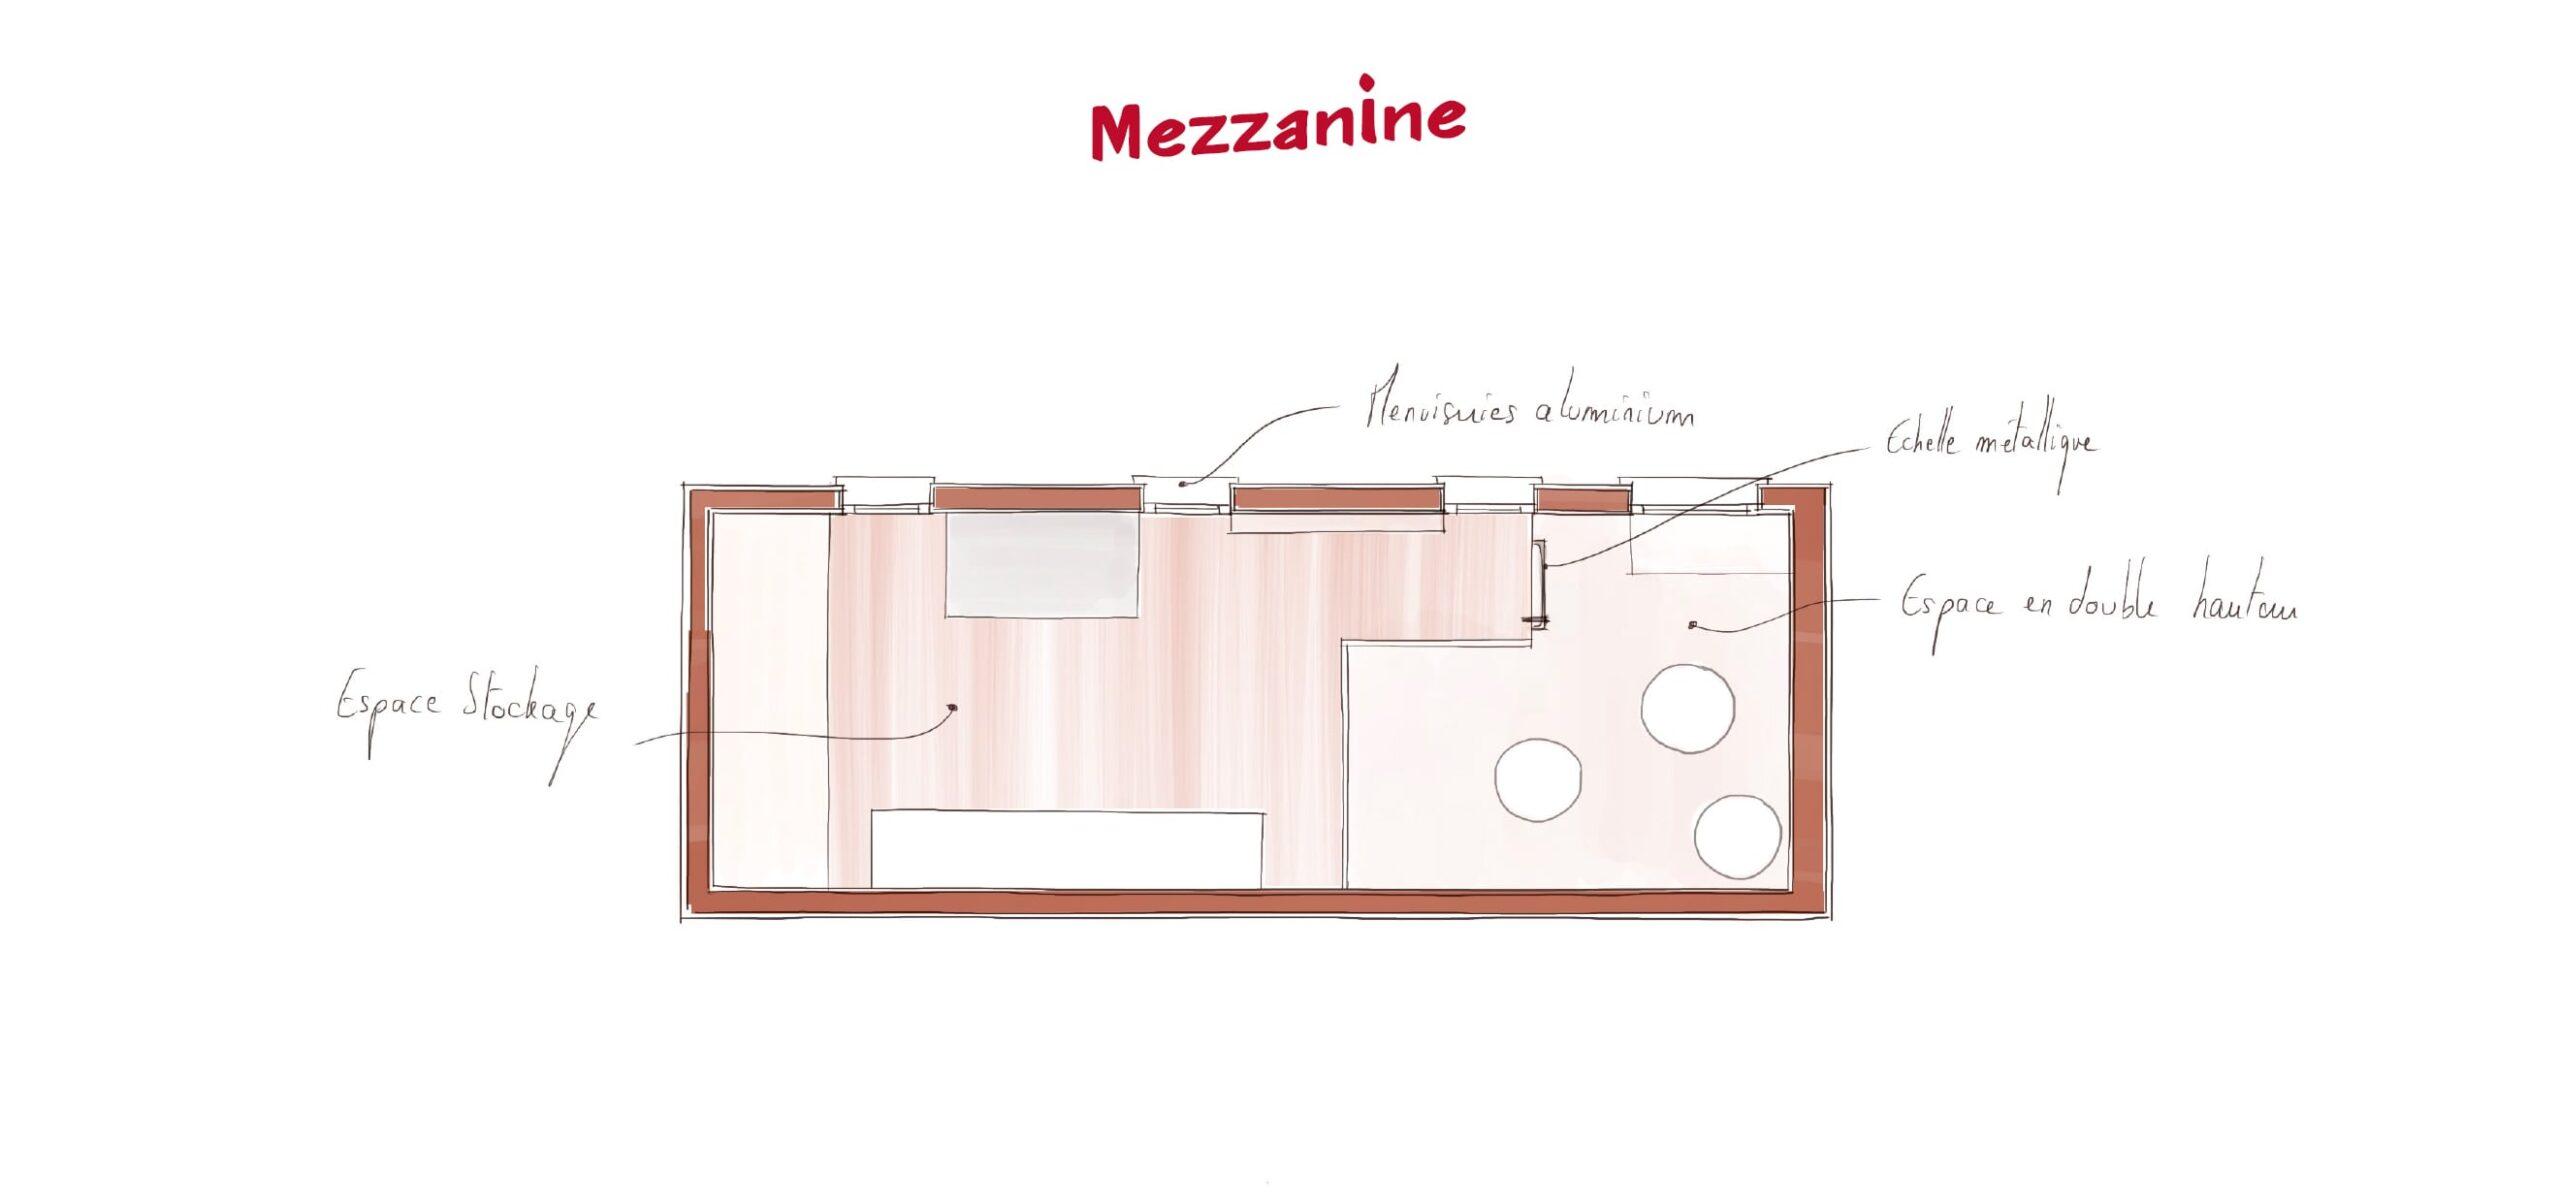 tiny-house-professionnel-food-truck-mezzanine